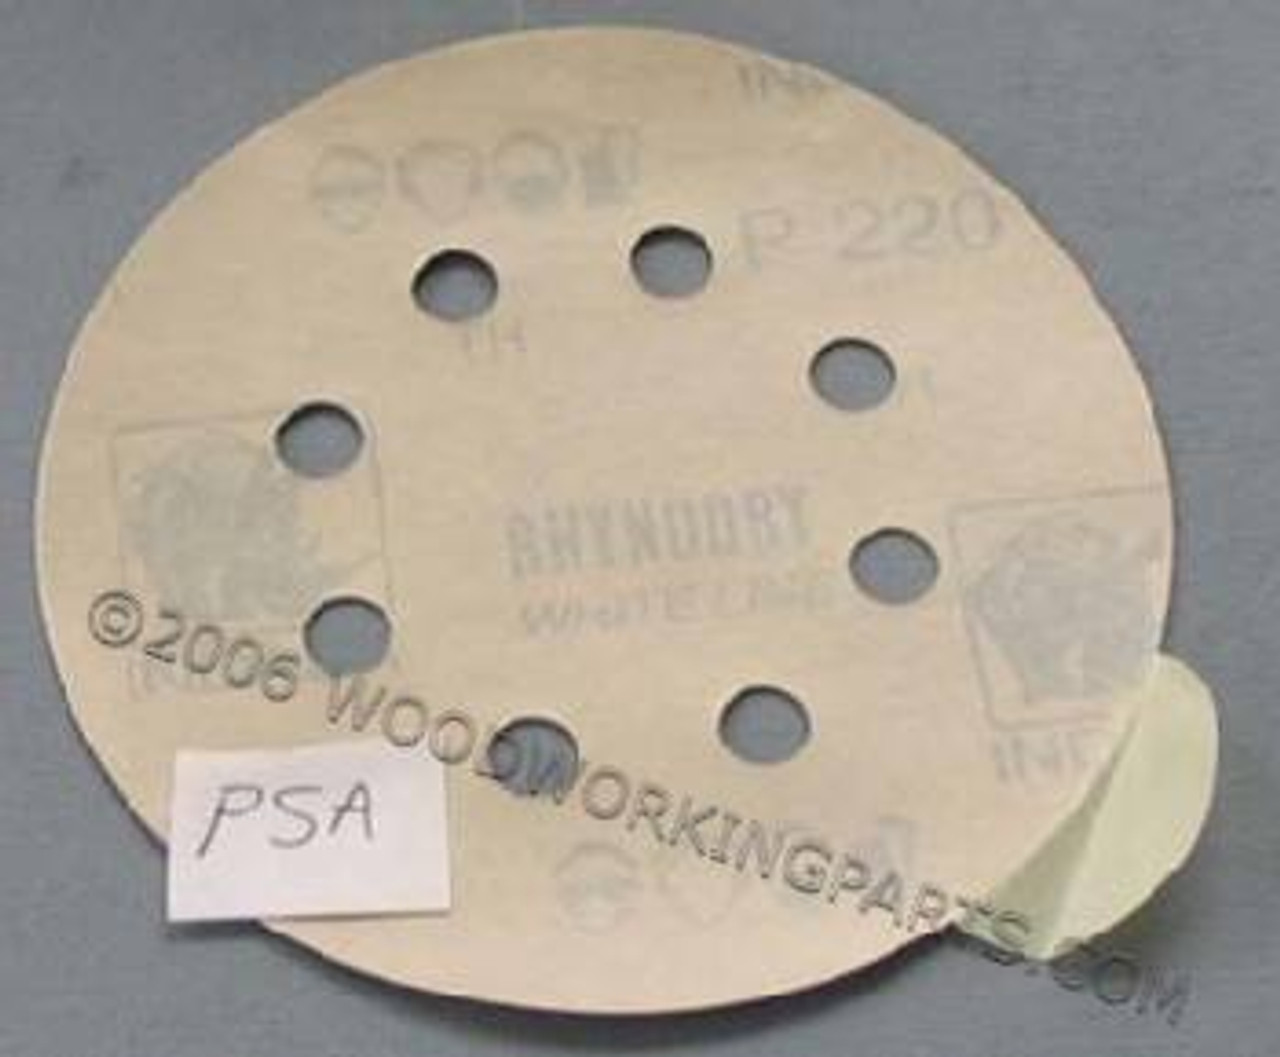 5 inch 8 hole psa sanding discs